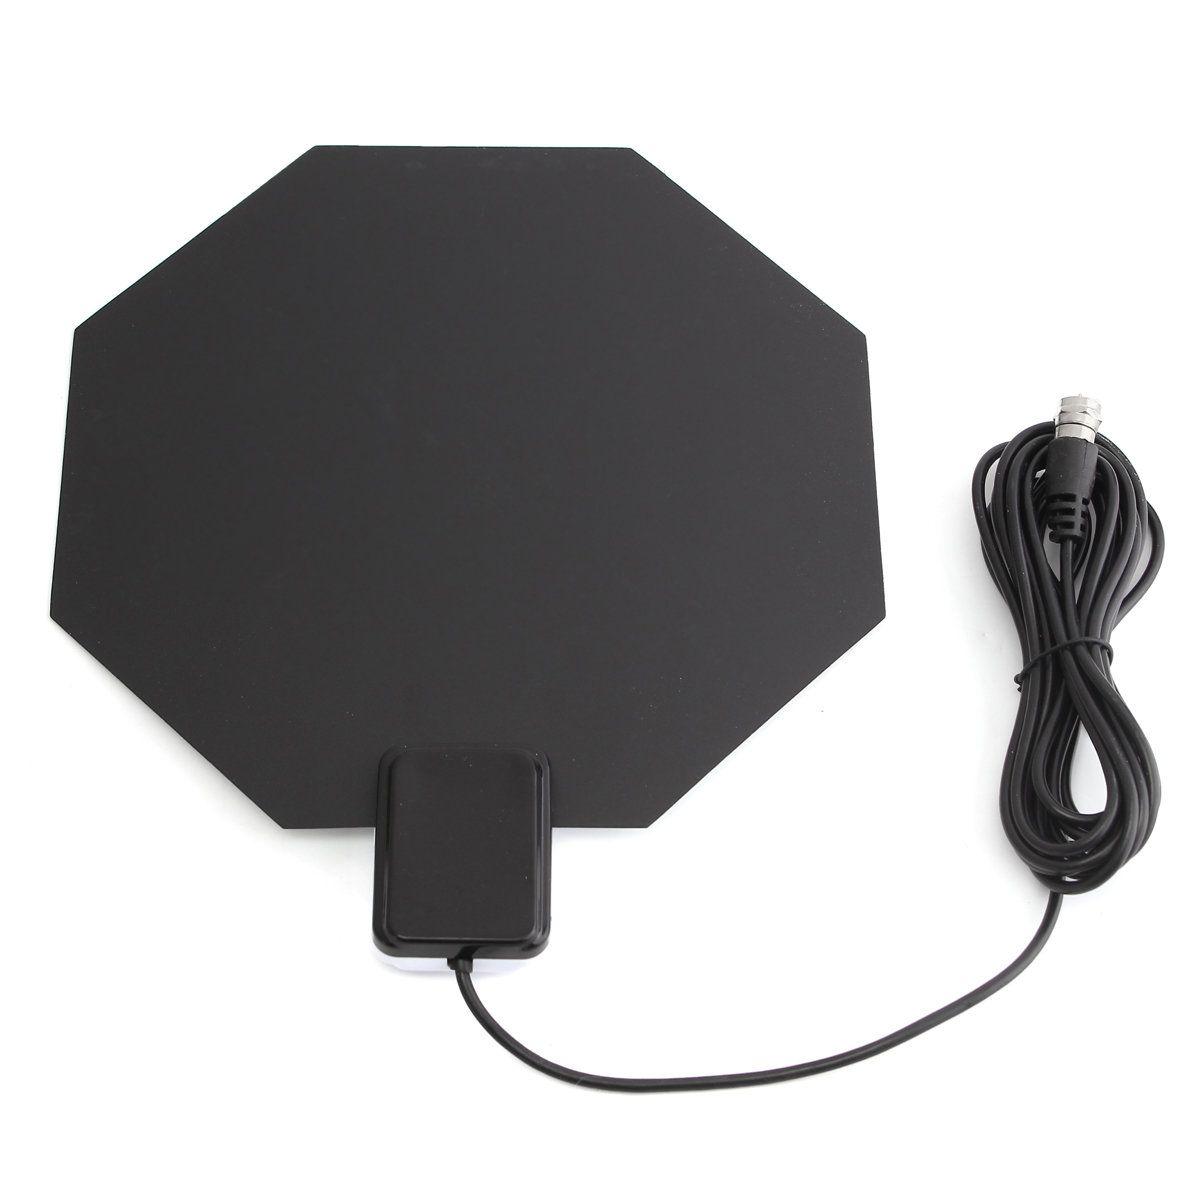 long range amplified flat indoor hdtv antenna vhf uhf digital analog tv hd  home